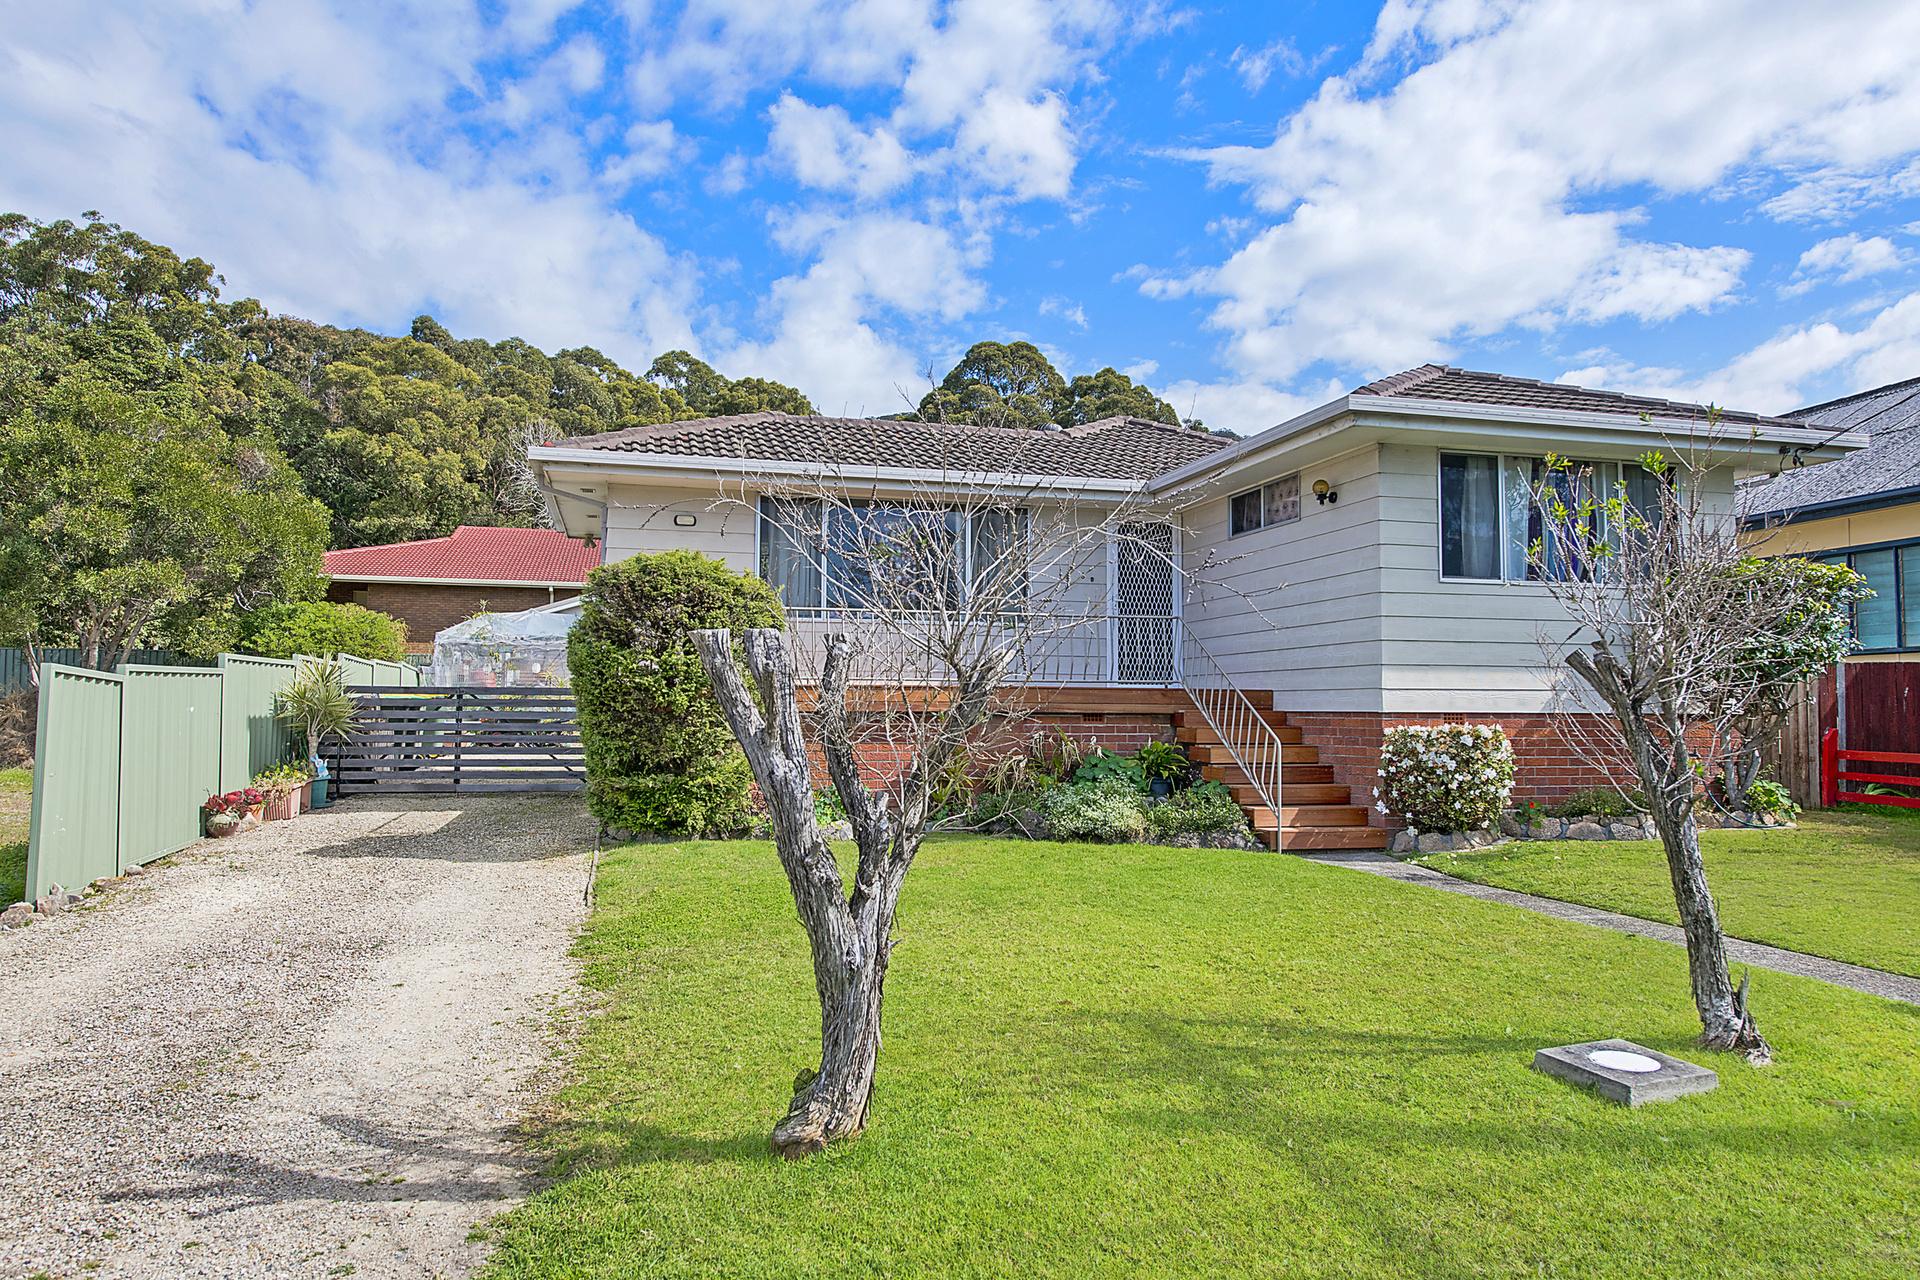 8 Kew Road, Laurieton, NSW, 2443 - Image 1